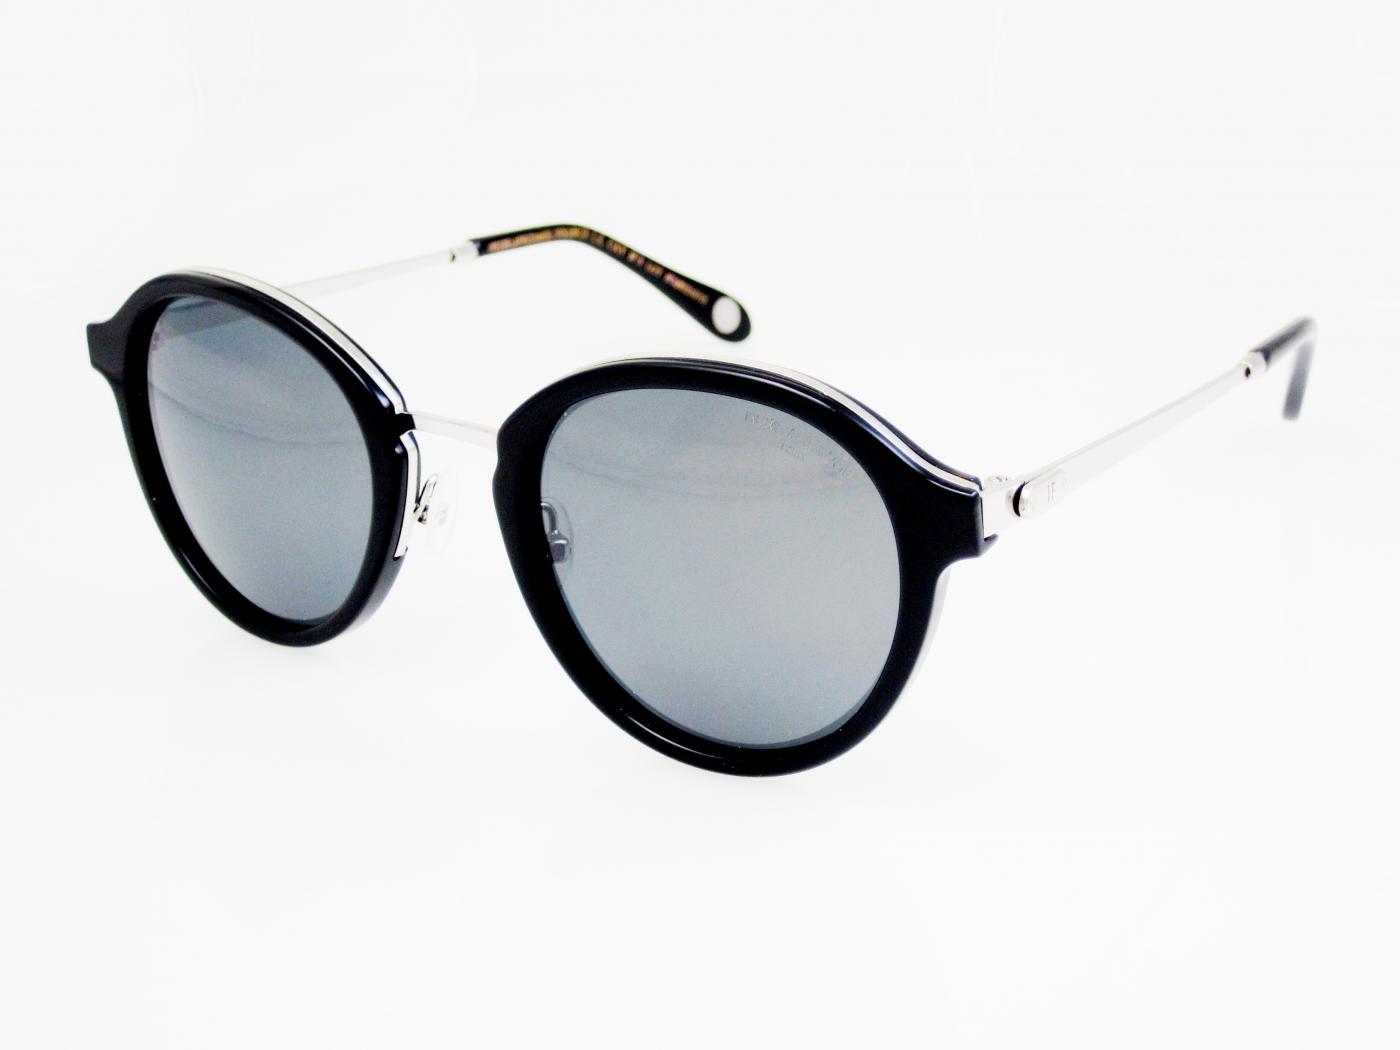 1835d3aef Dámske slnečné okuliare Ines de la Fressange   oftalens.sk